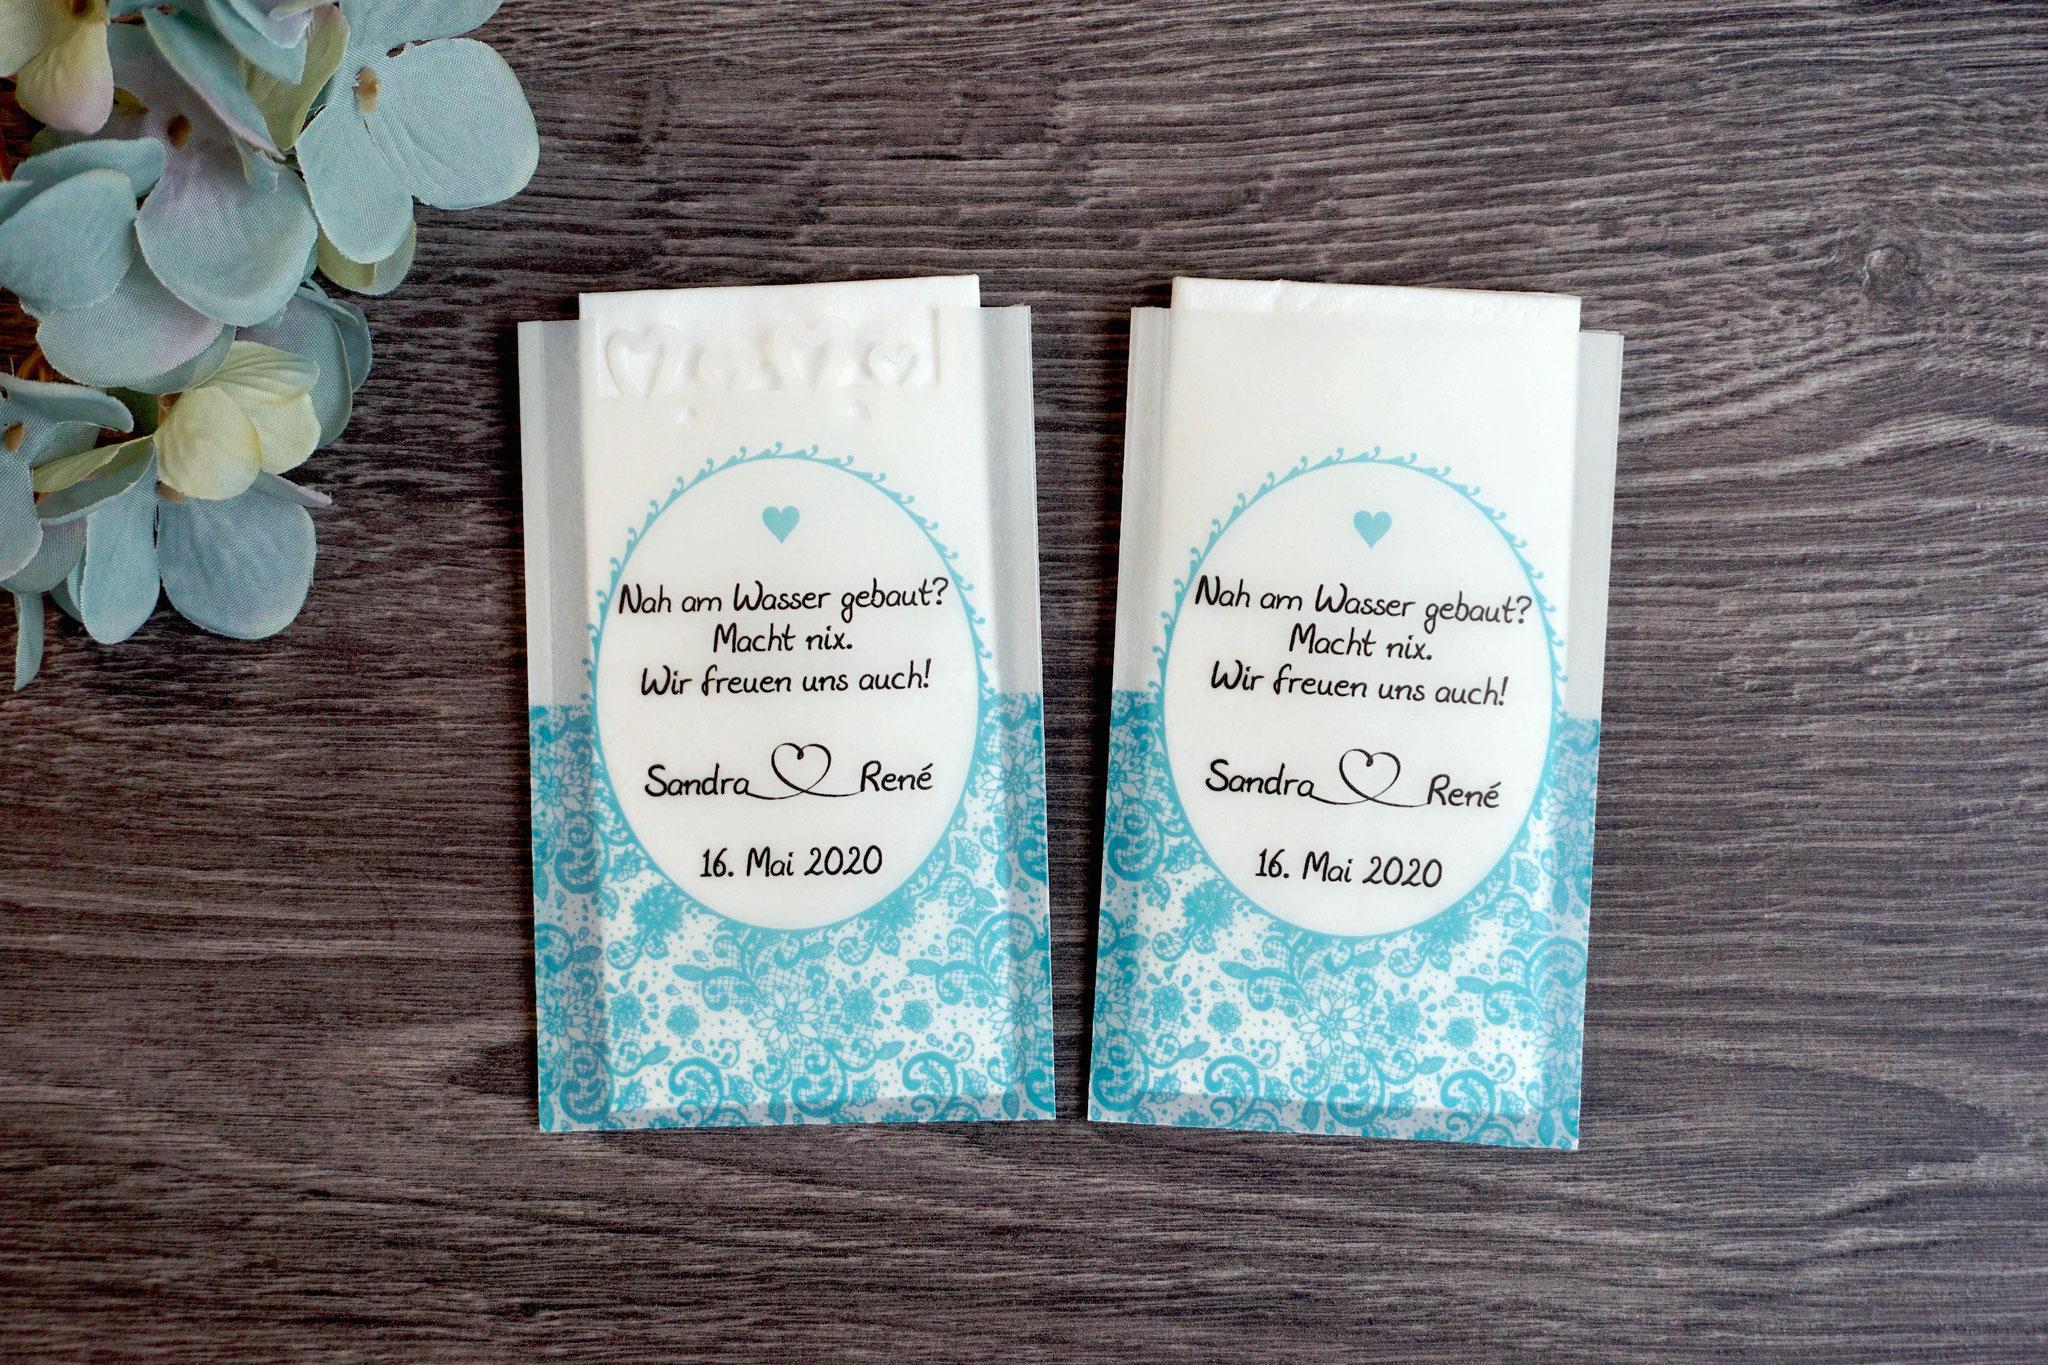 Freudentränen Taschentücher Design Romantik, Farbe Türkis dunkel